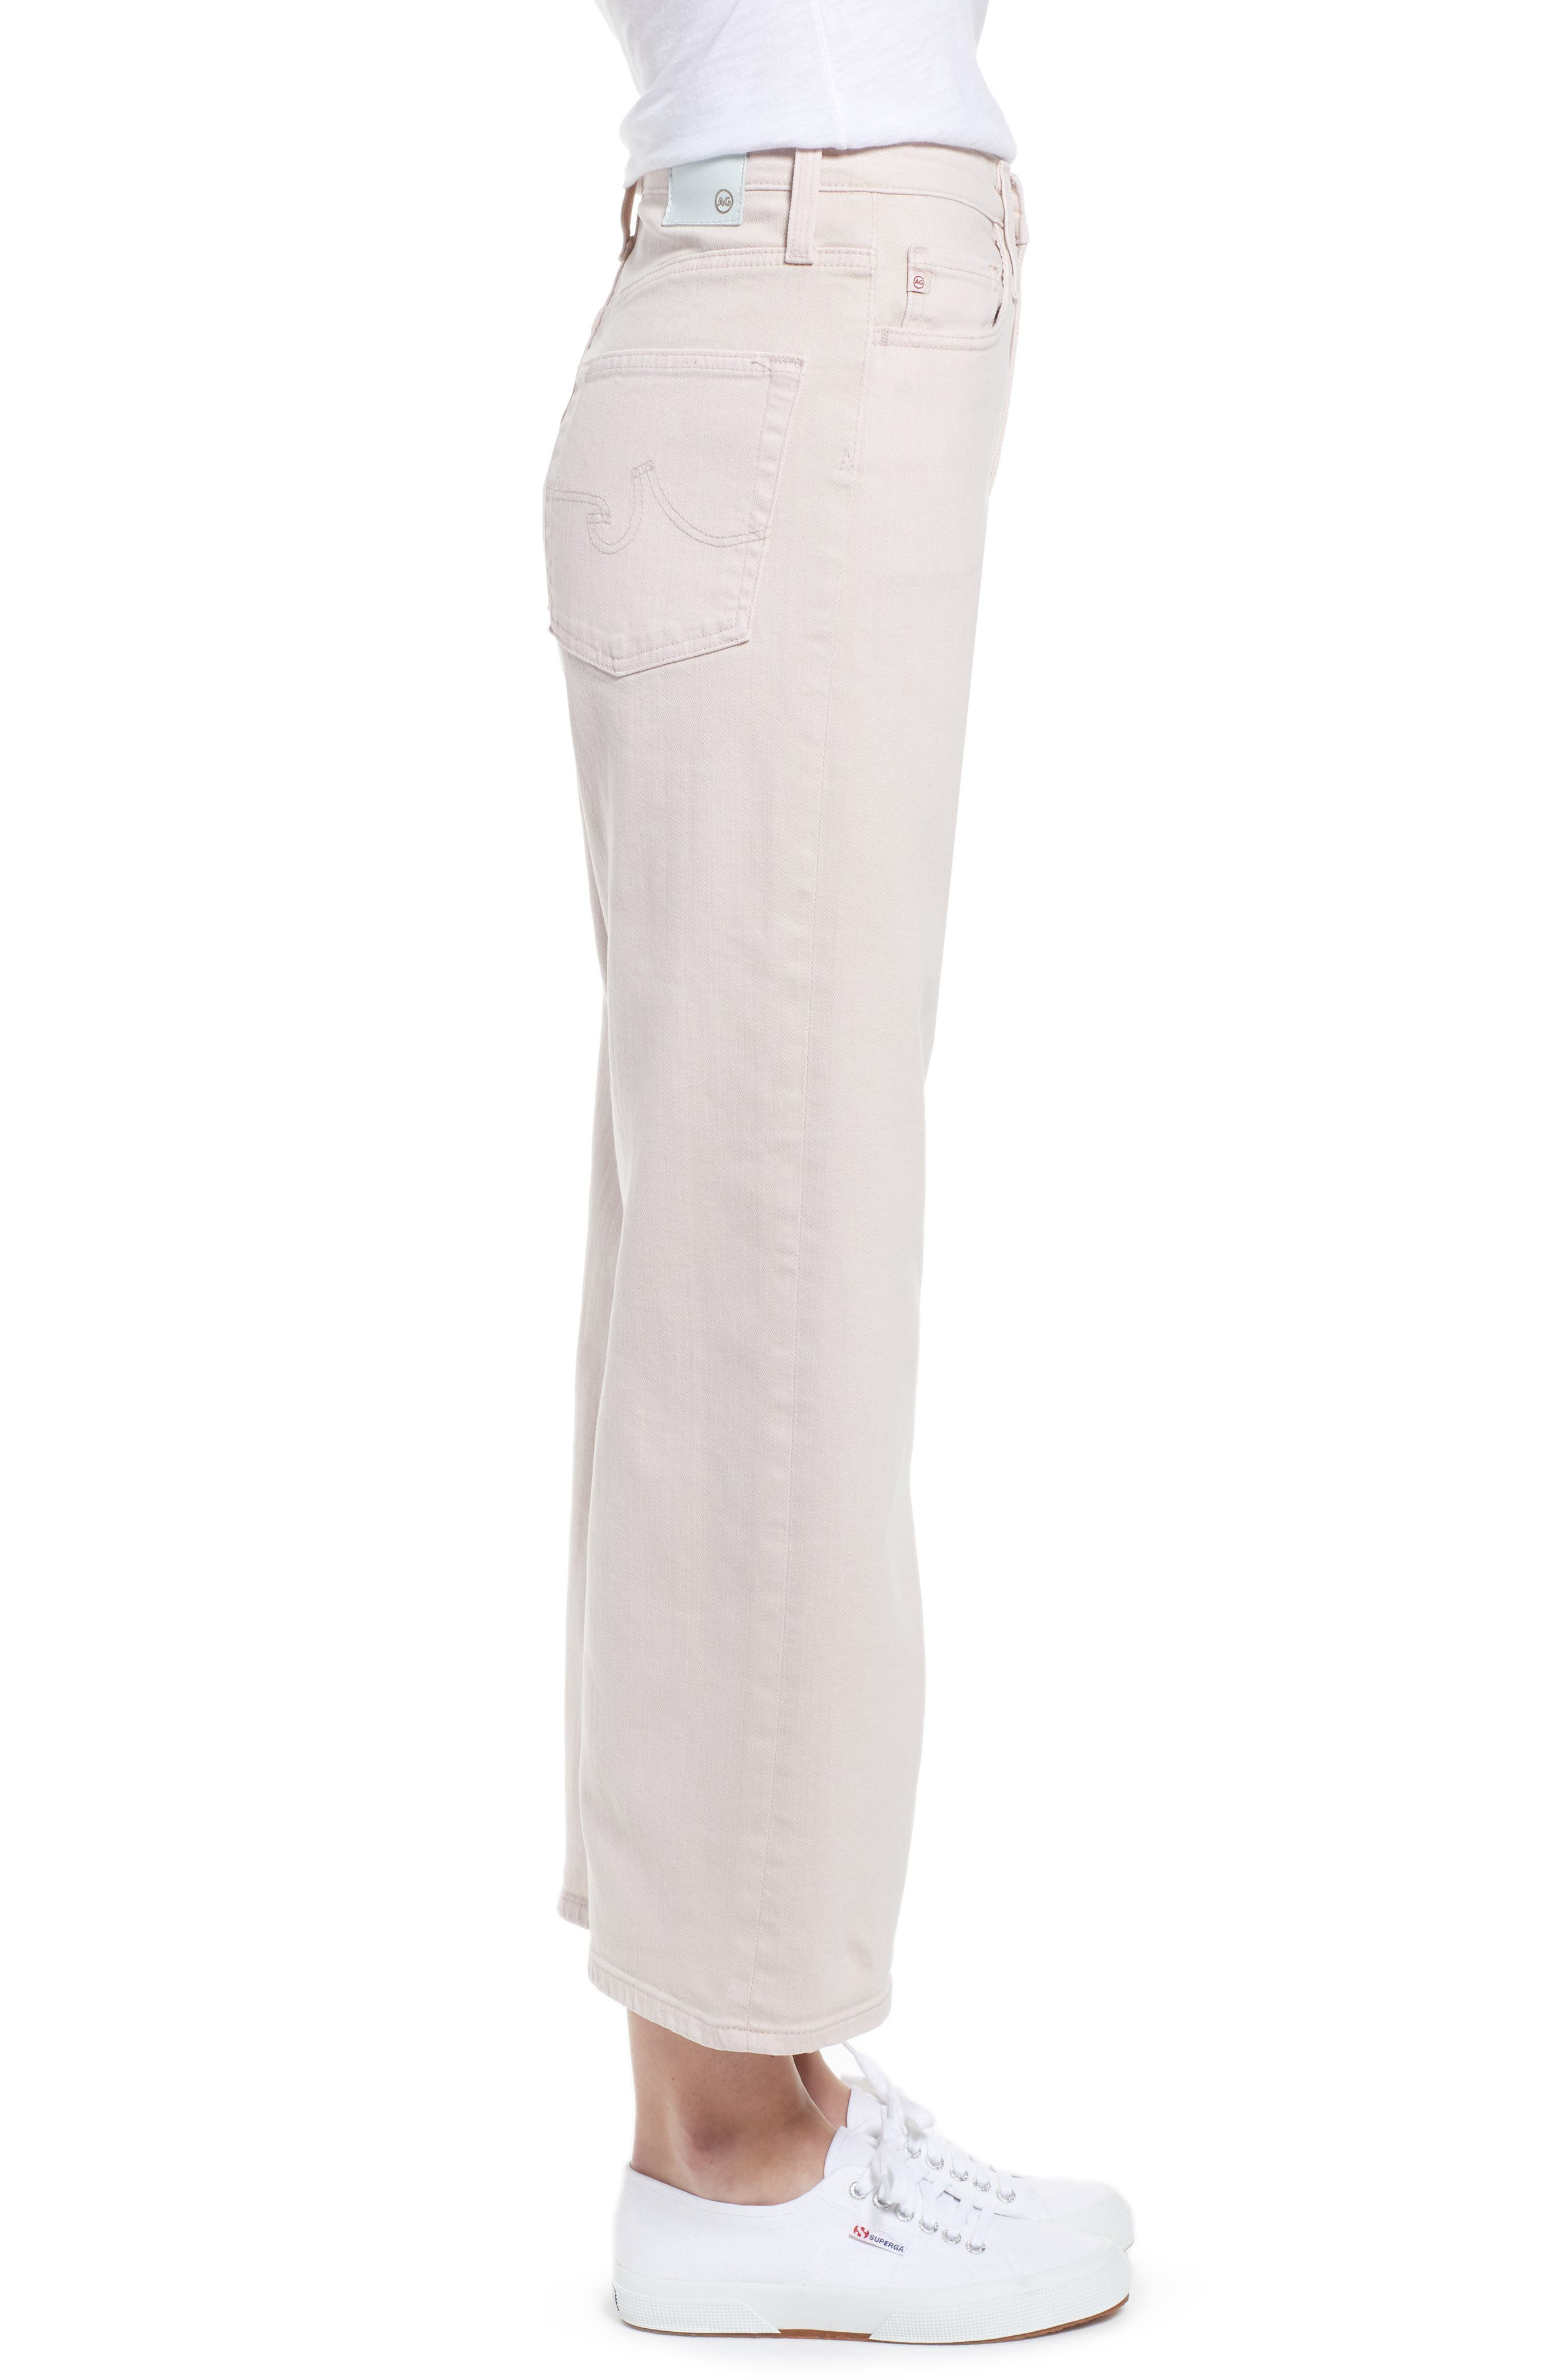 AG, Etta High Waist Crop Wide Leg Jeans, Alternate thumbnail 4, color, SULFUR PEAKED PINK